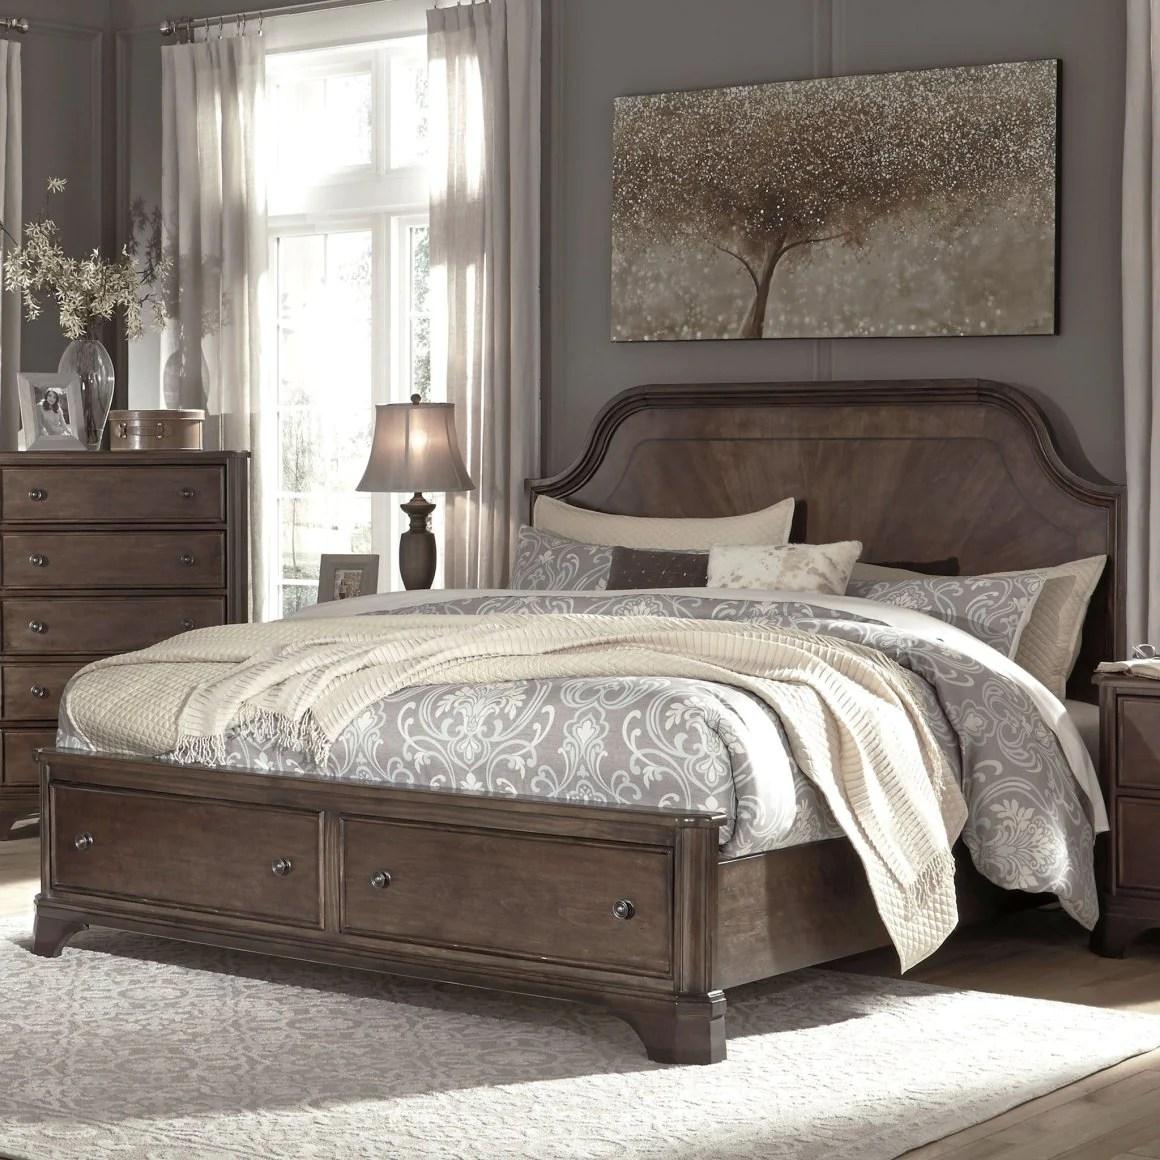 dormitoare mici amenajate